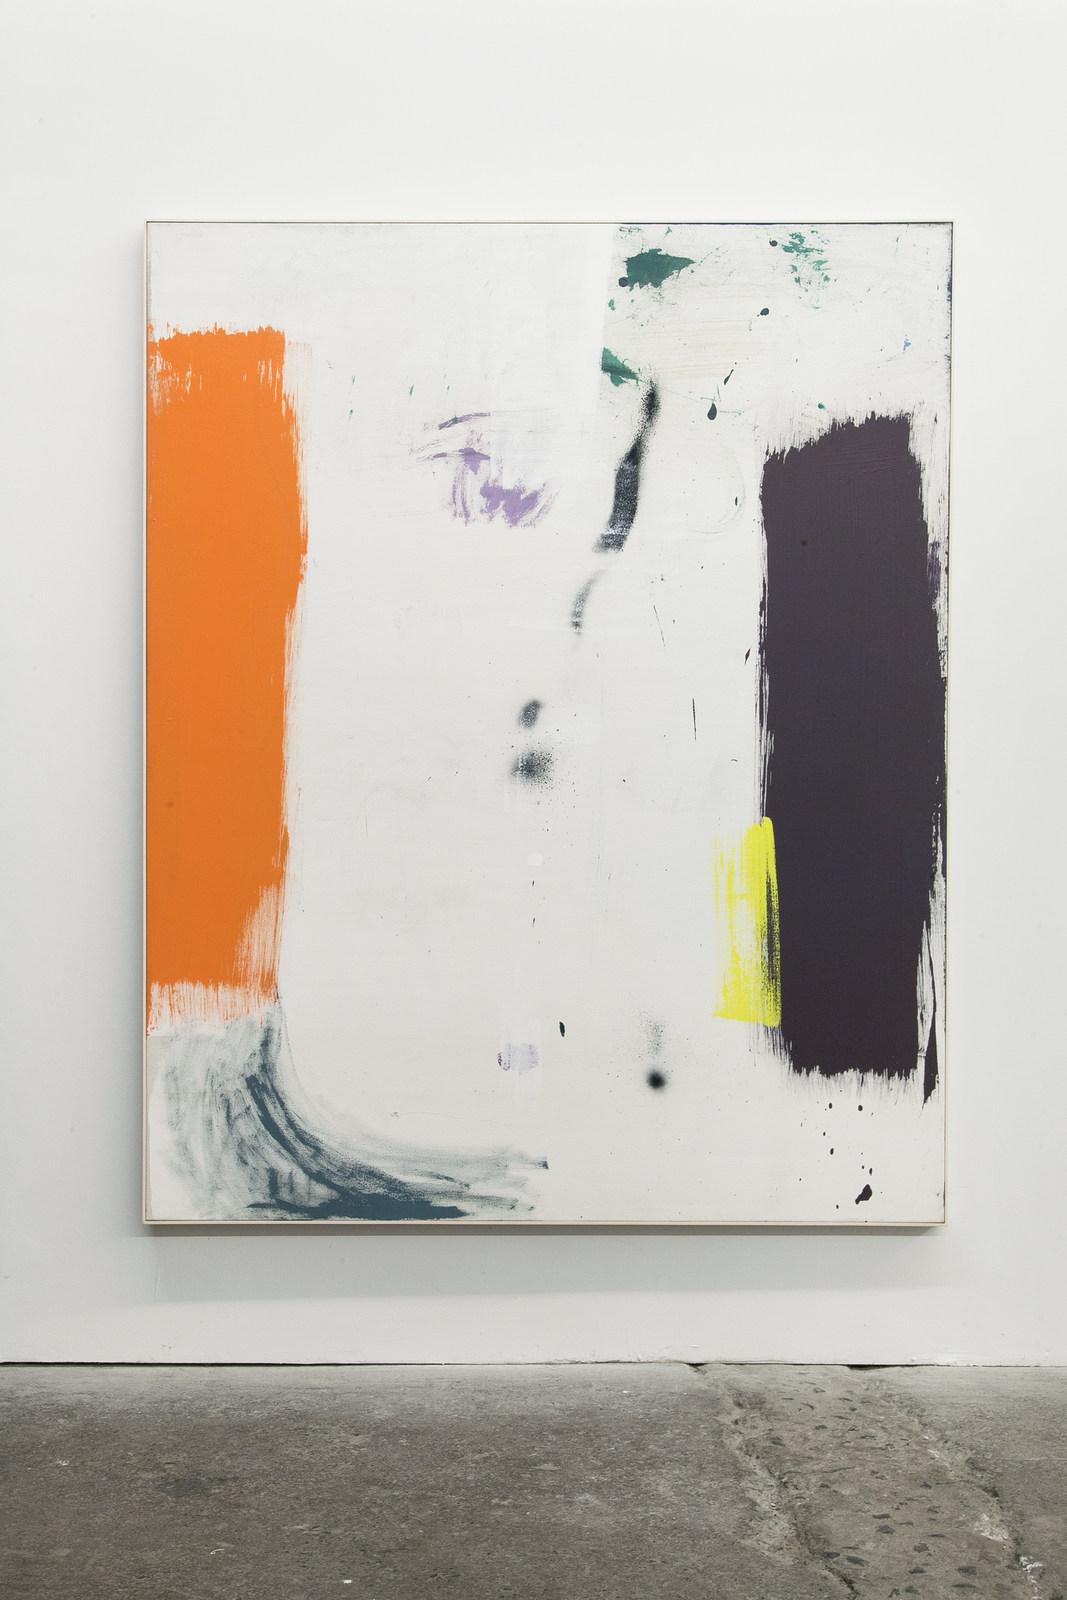 02_Jean-François Lauda. Untitled 32. Acrylic on canvas 193 x 152.5 cm. 2016